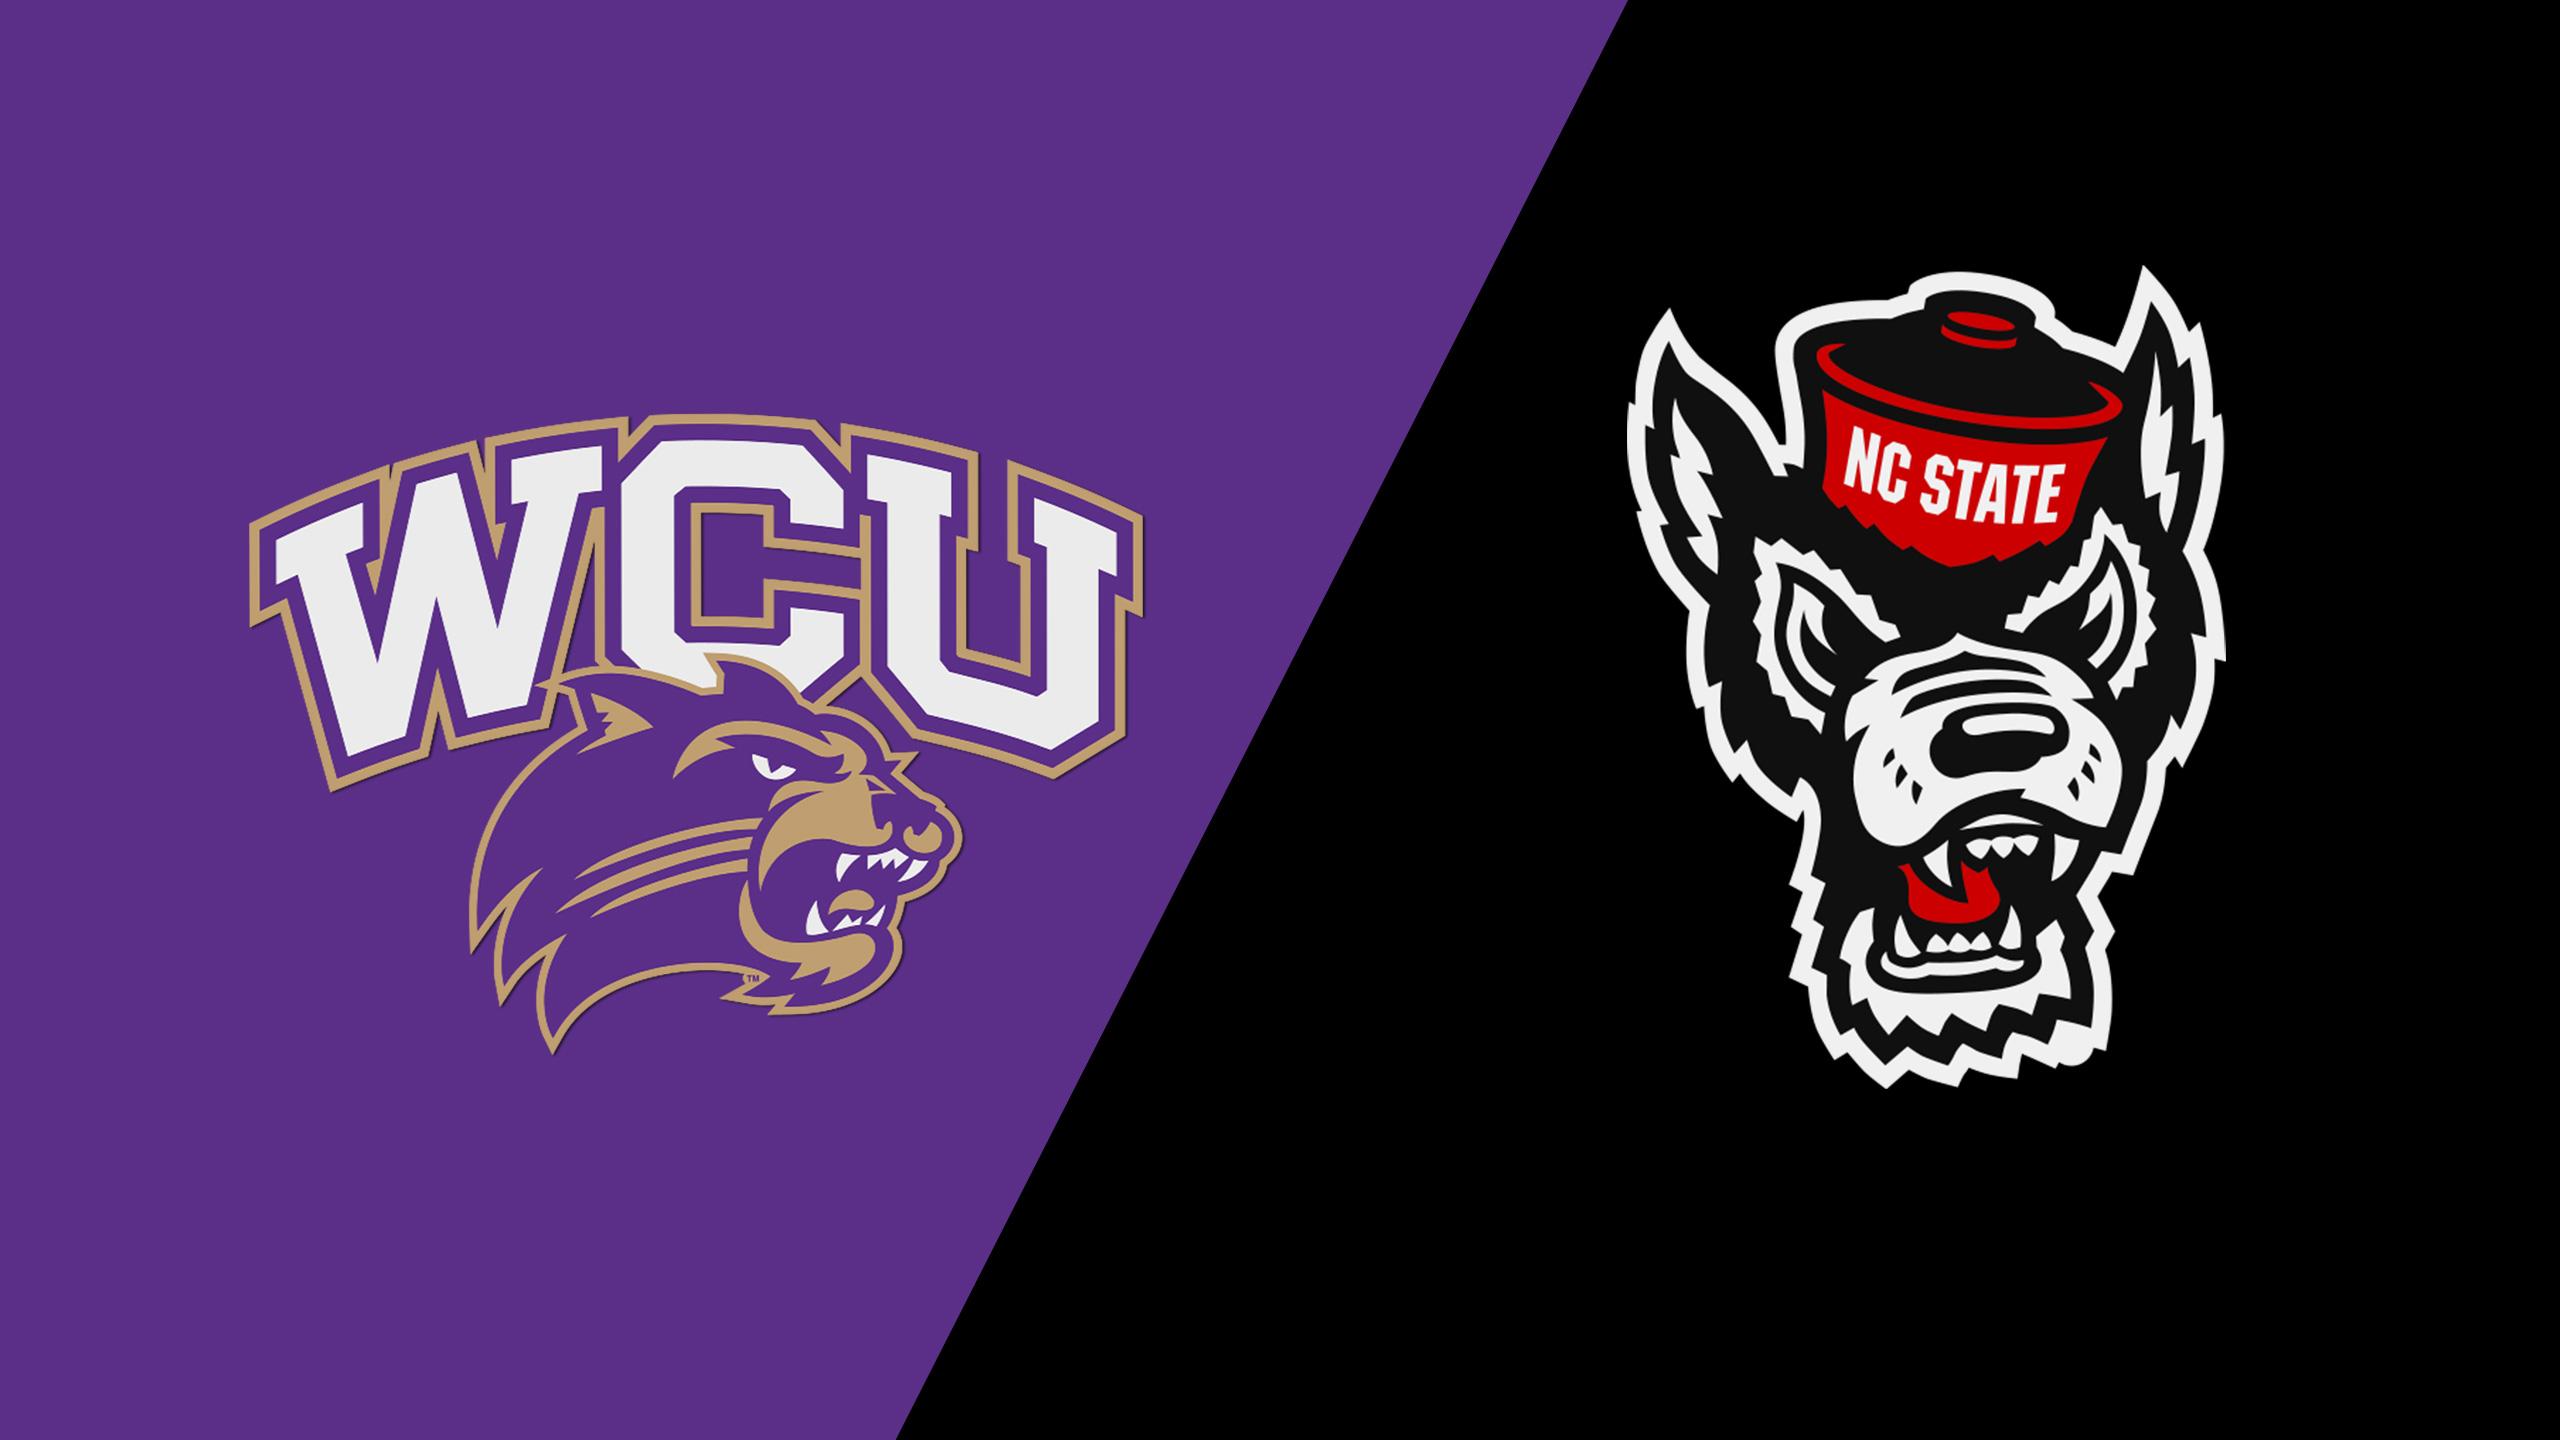 Western Carolina vs. NC State (M Basketball)